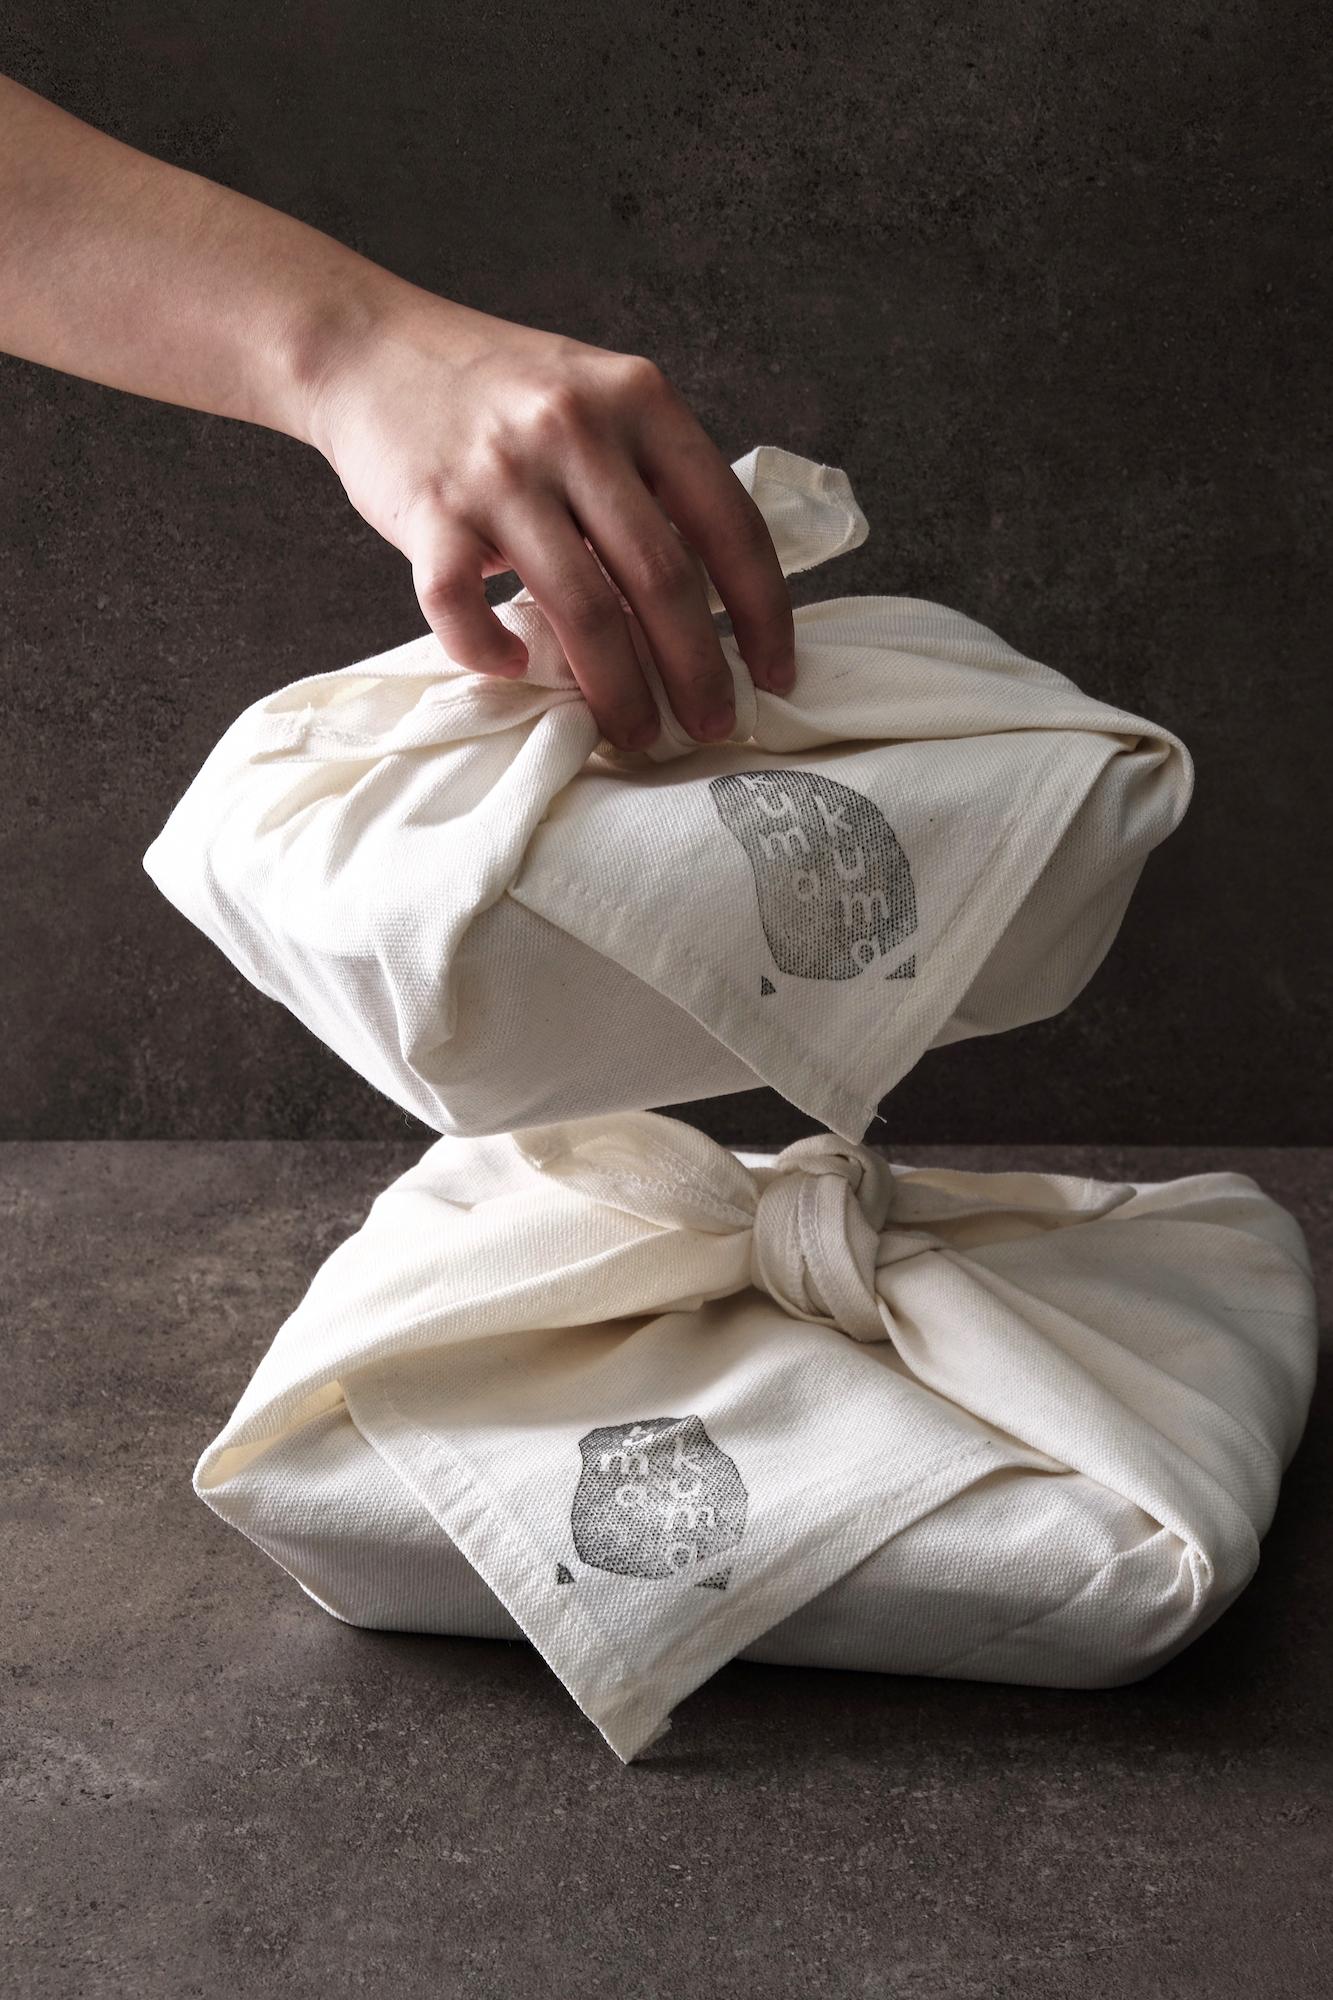 The package design of Kumakuma Curry follows the Japanese practice of furoshiki